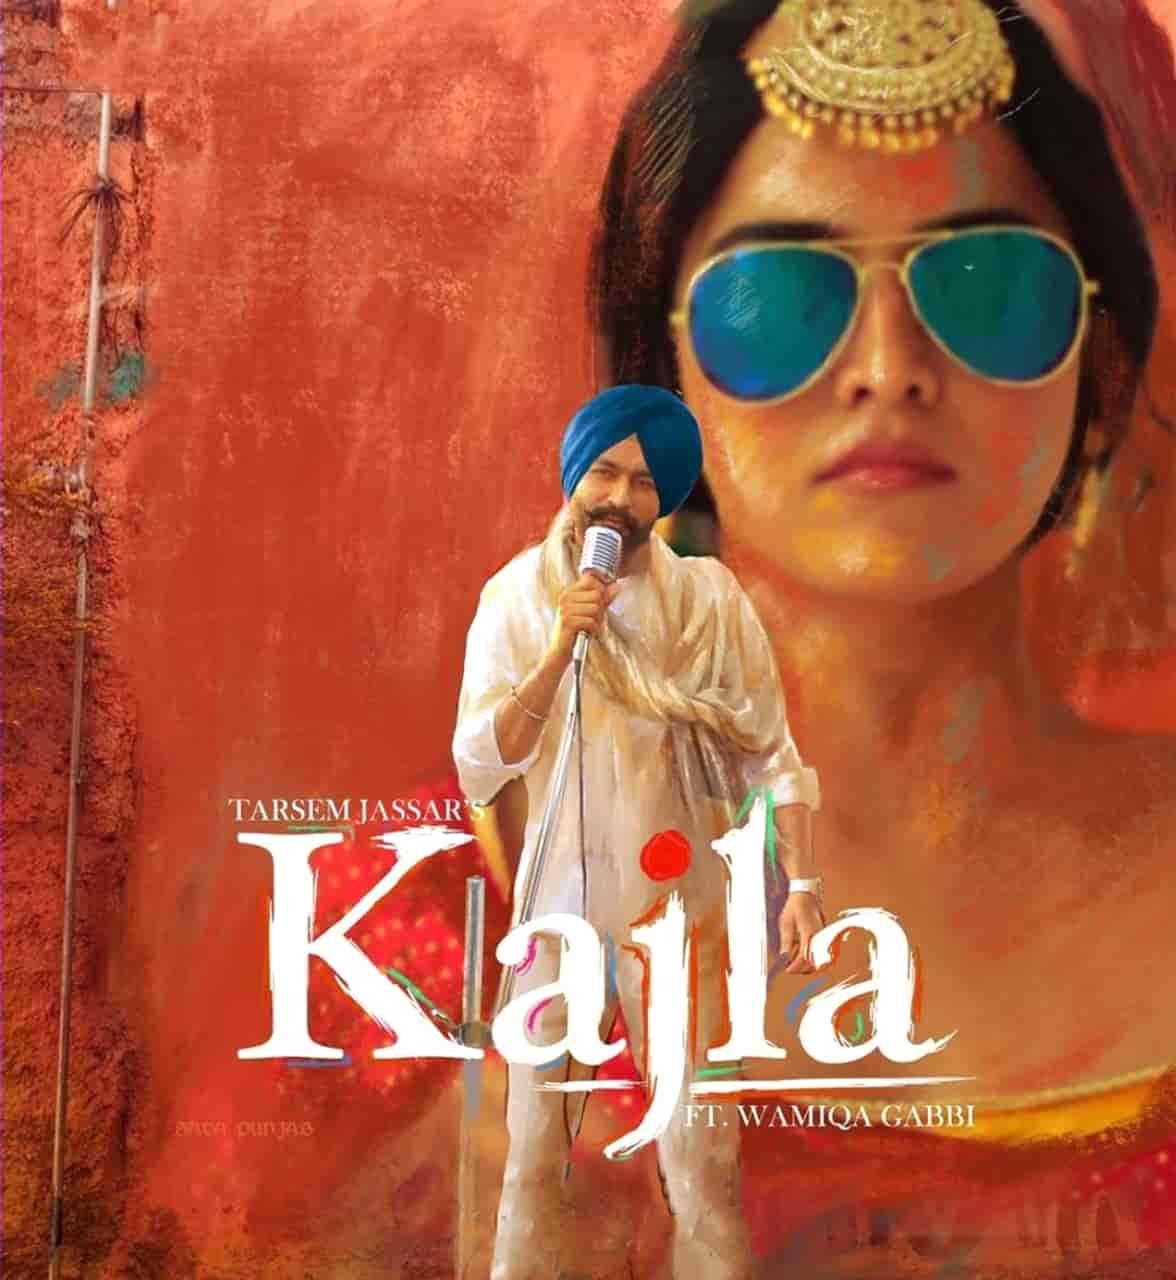 Kajla Punjabi Song Image Features Wamiqa Gabbi by Tarsem Jassar